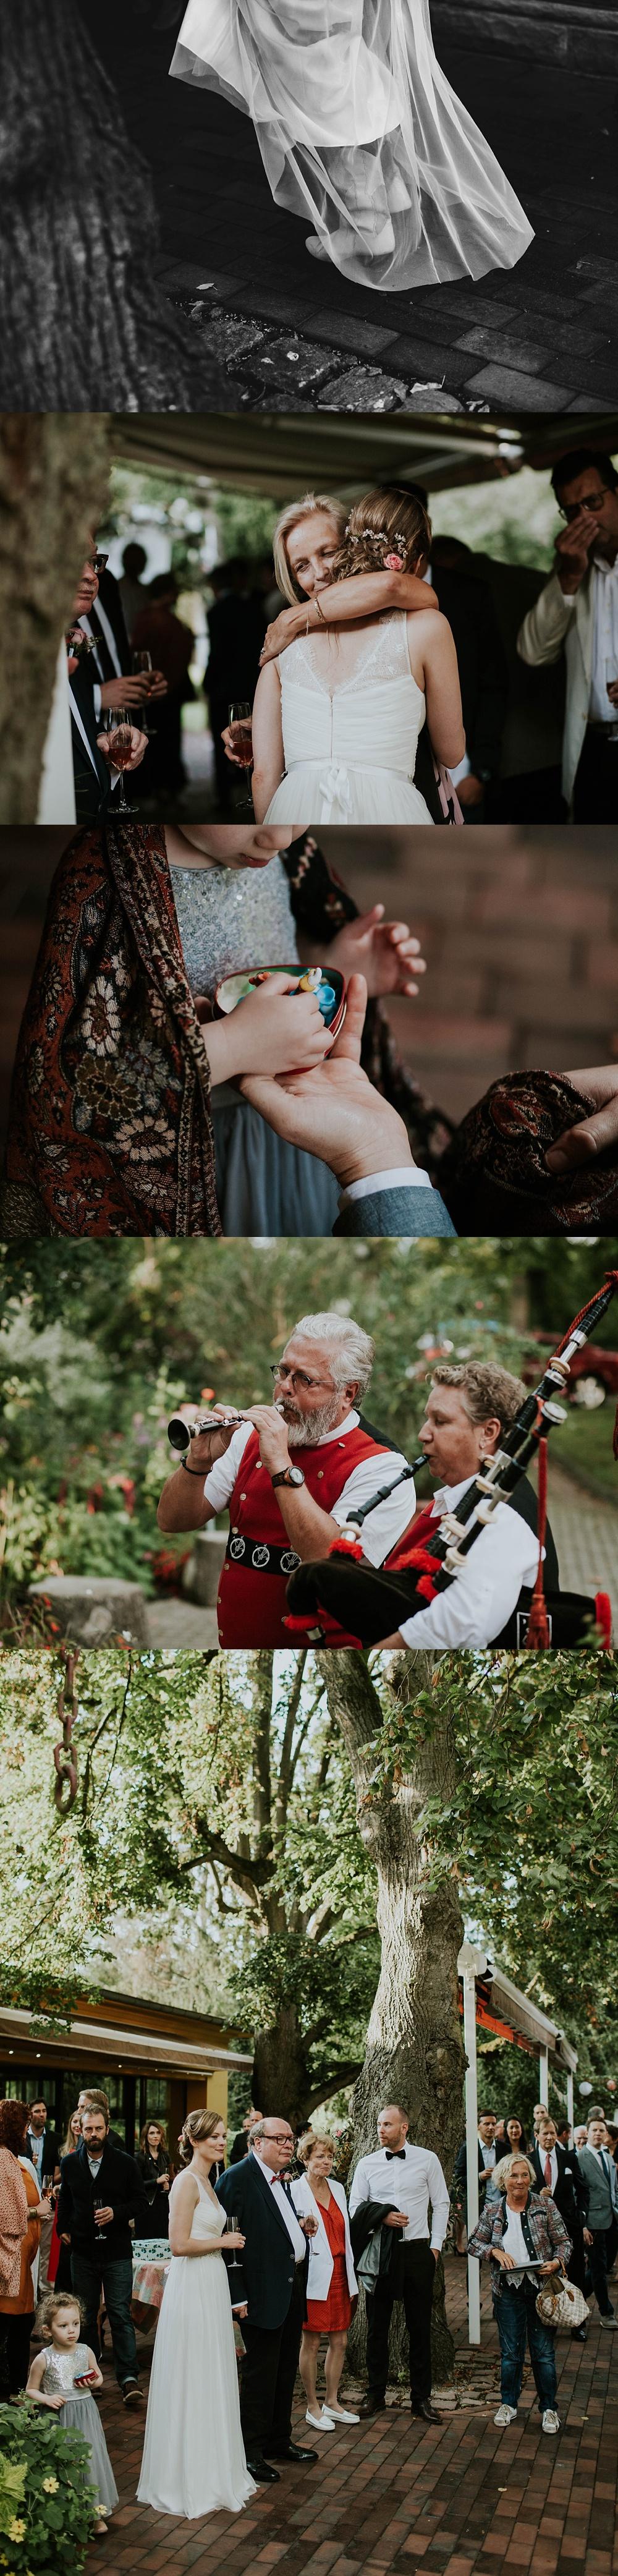 Mariage à Strasbourg en Alsace